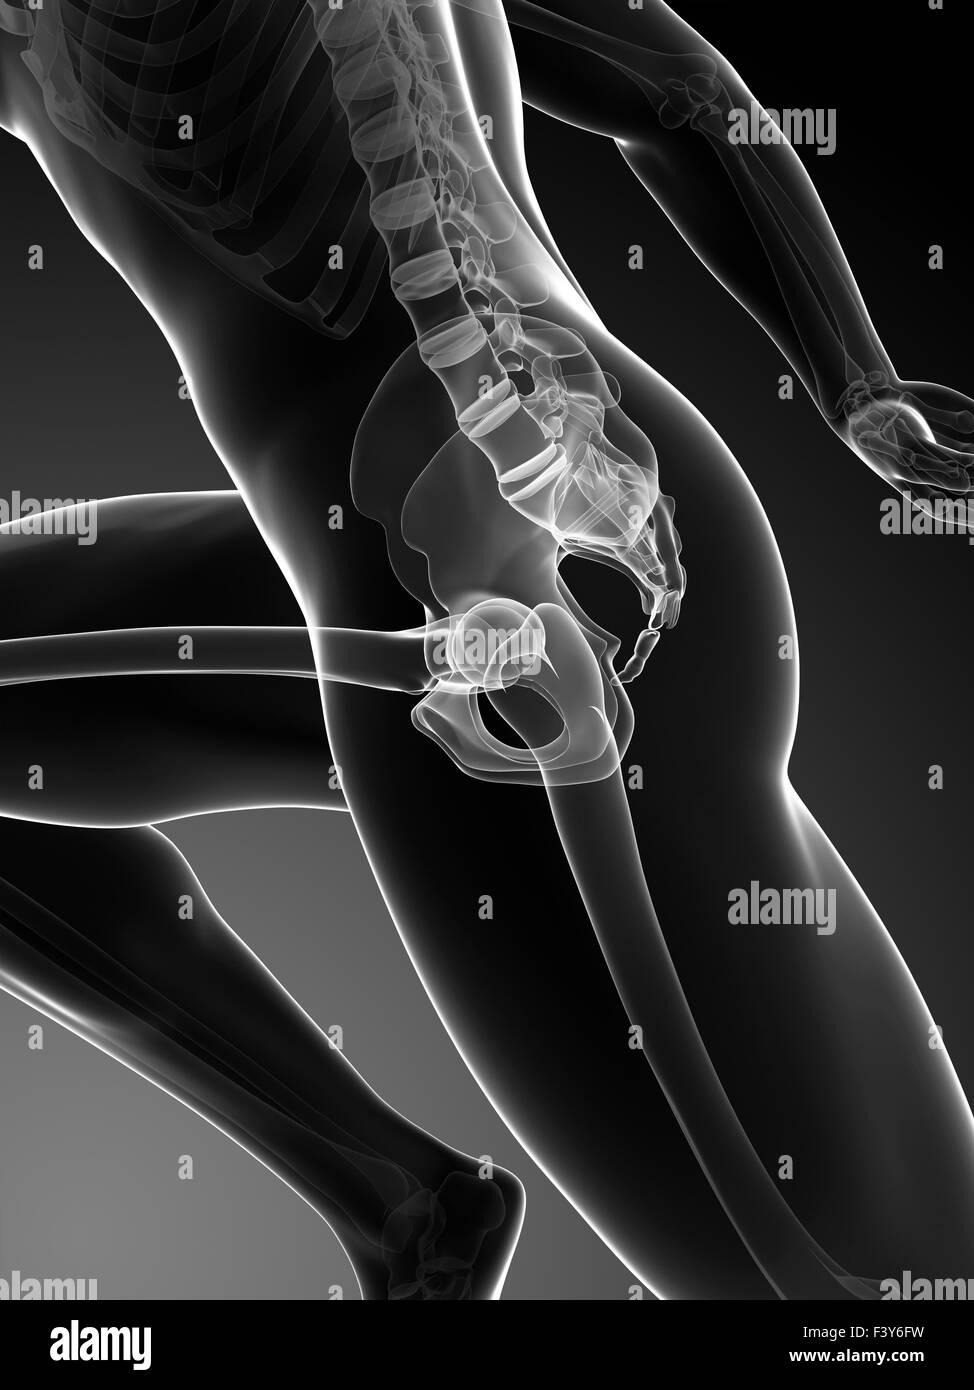 Human Anatomy Running Black and White Stock Photos & Images - Alamy